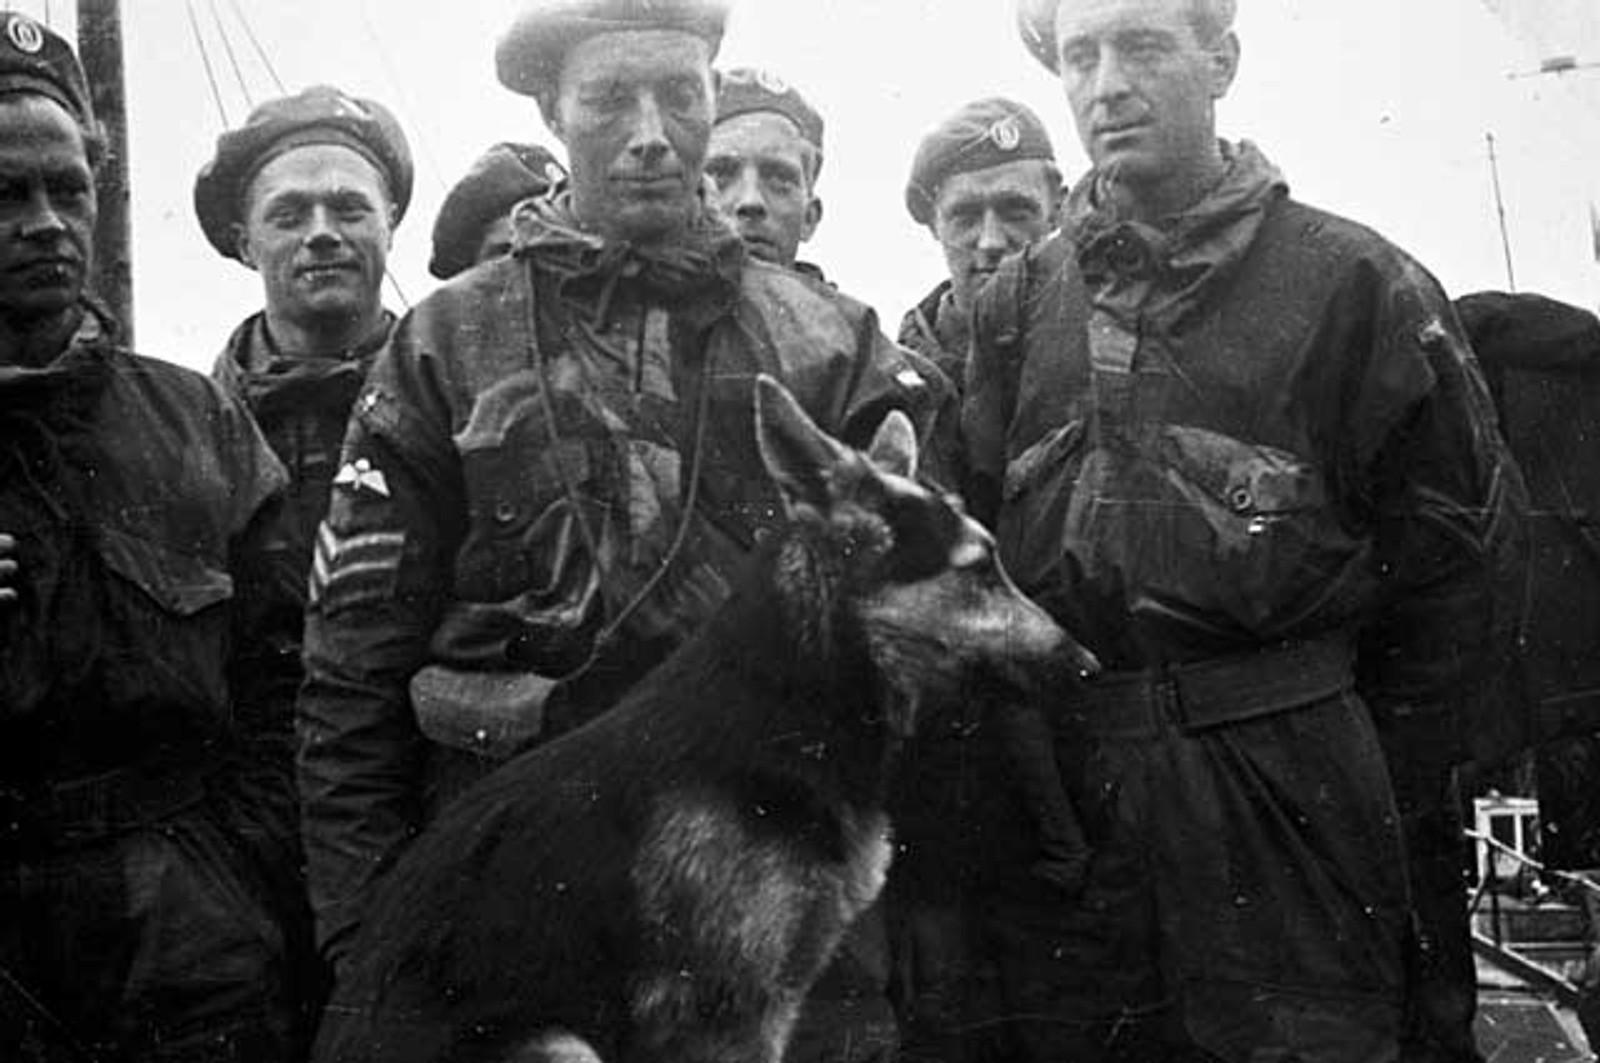 NORSKE TROPPER: Norske fallskjermtropper ankommer byen sammen med en hund i bånd.